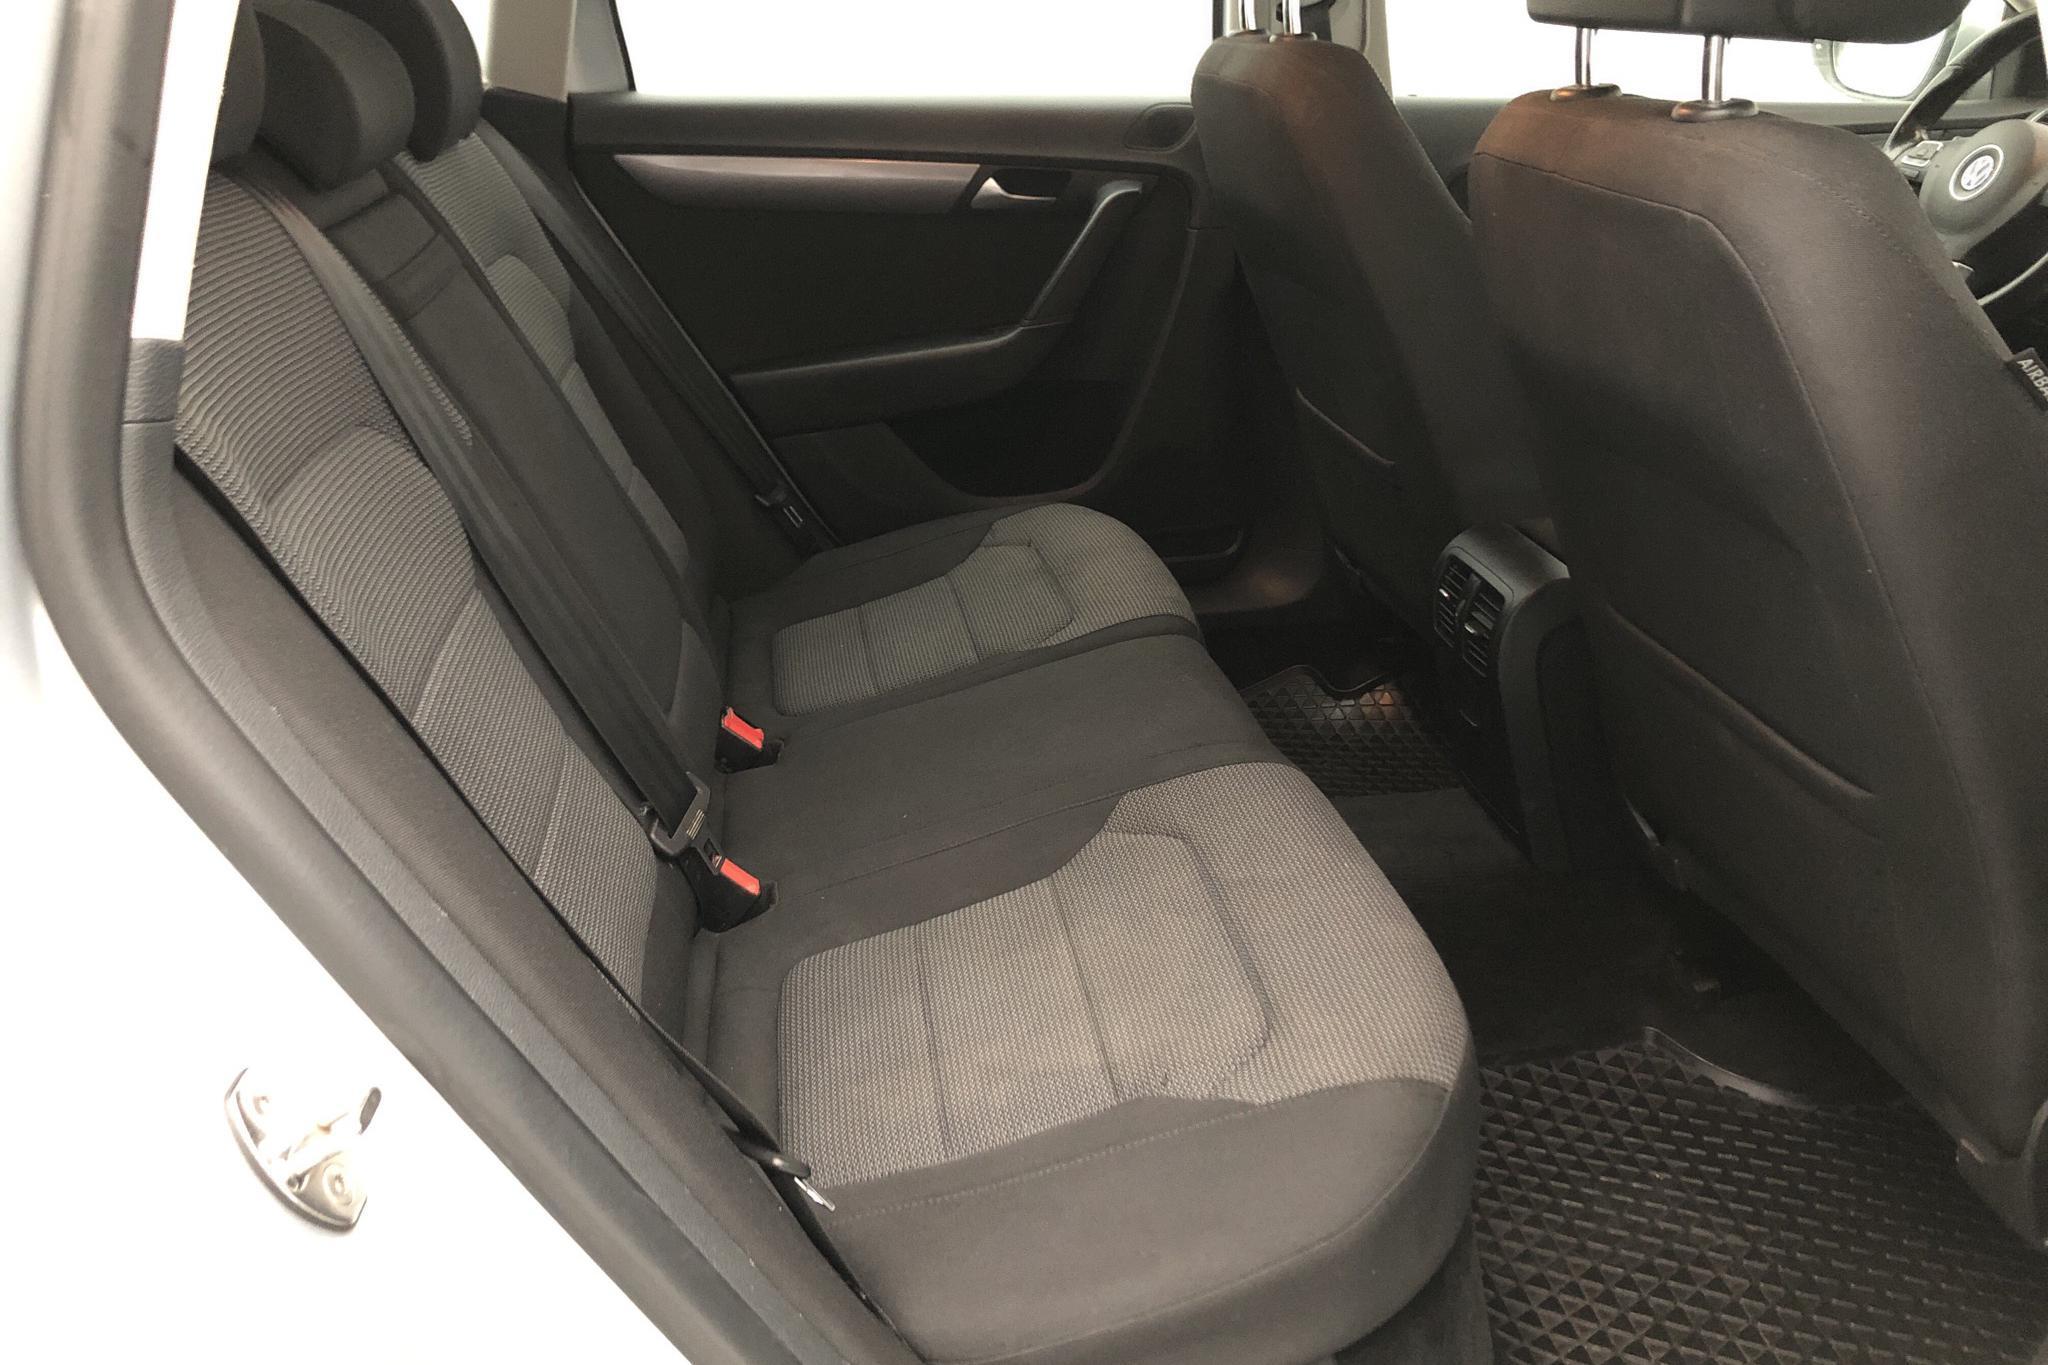 VW Passat 2.0 TDI BlueMotion Technology Variant (170hk) - 233 360 km - Automatic - silver - 2011